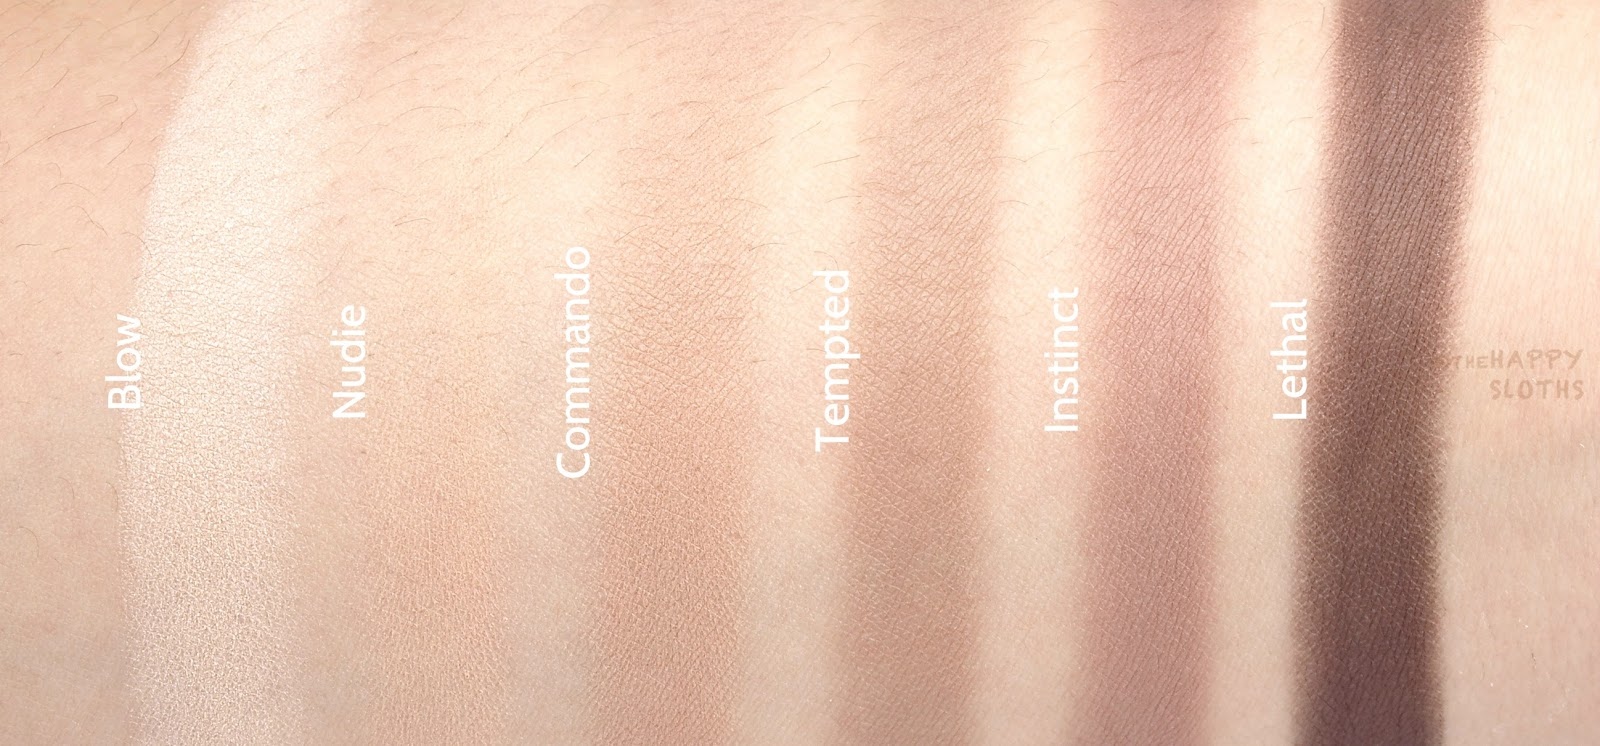 Urban Decay Naked Ultimate Basics Eyeshadow Palette -6821